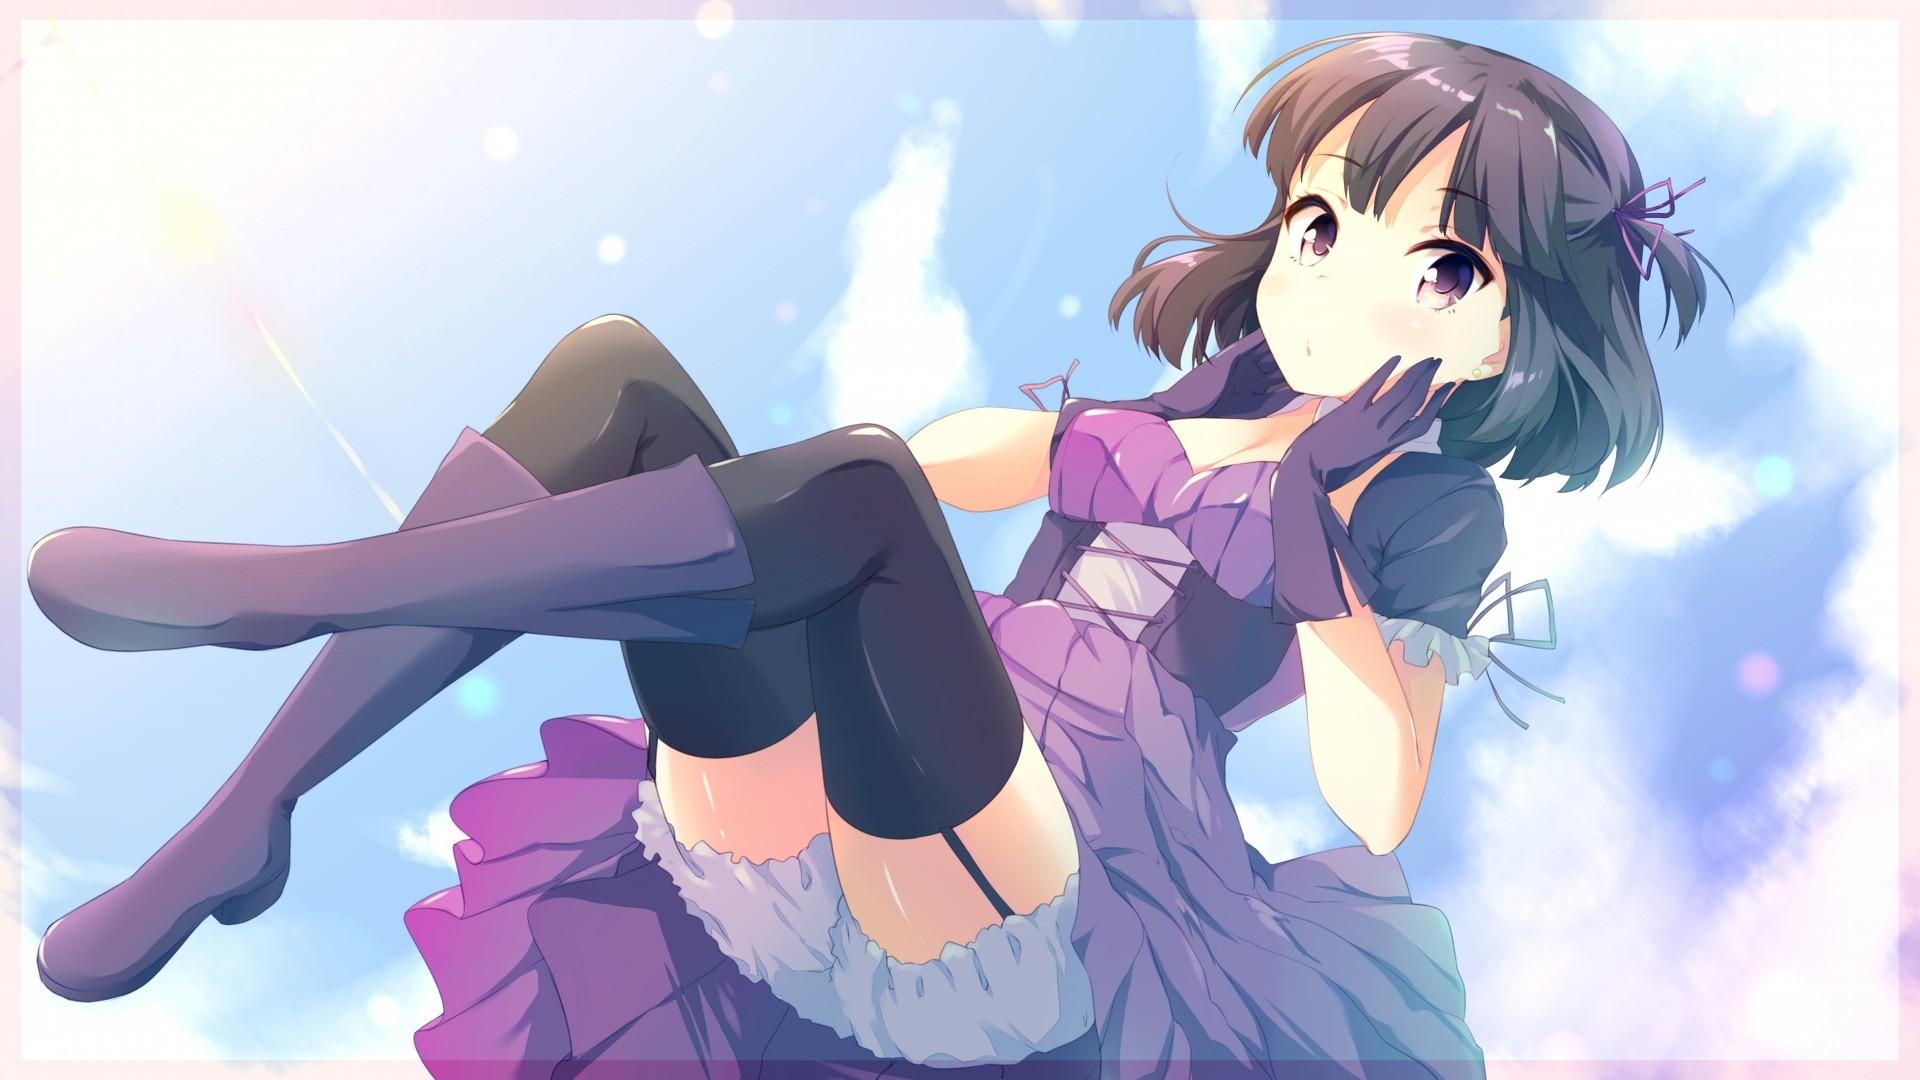 Wallpaper : illustration, anime girls, short hair, gloves, cartoon, black hair, thigh highs ...